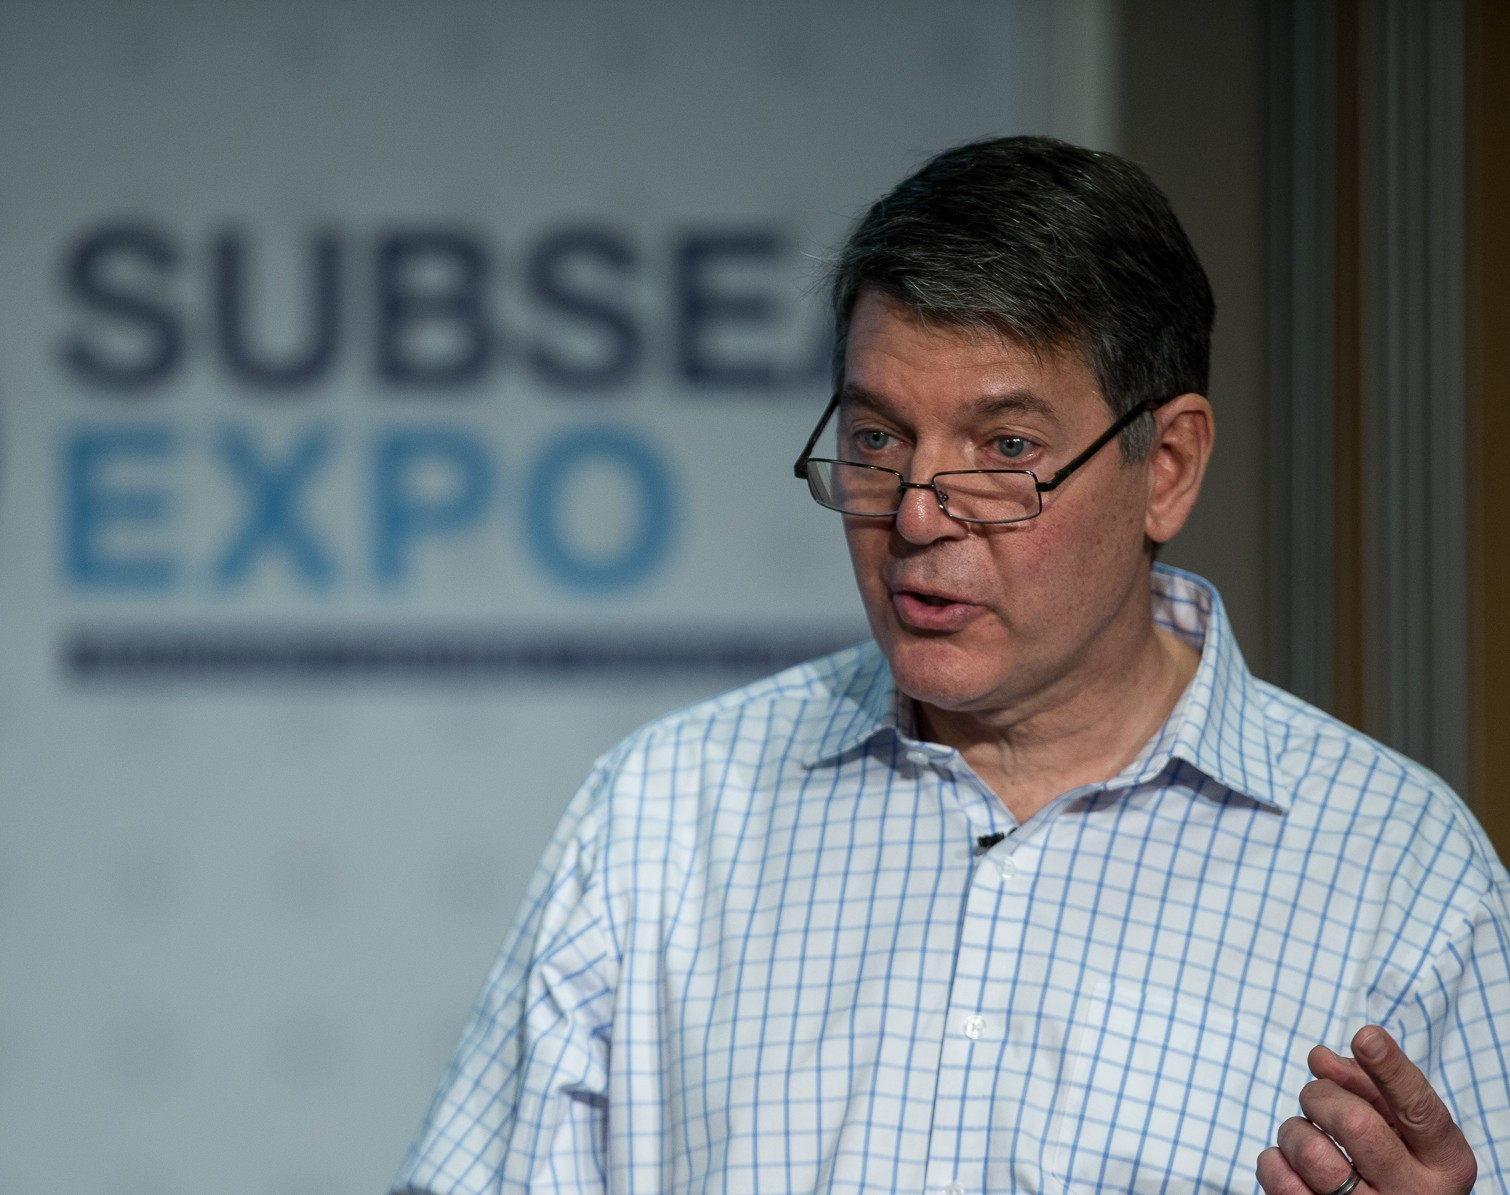 Chris Bird, managing director of Mol Energy